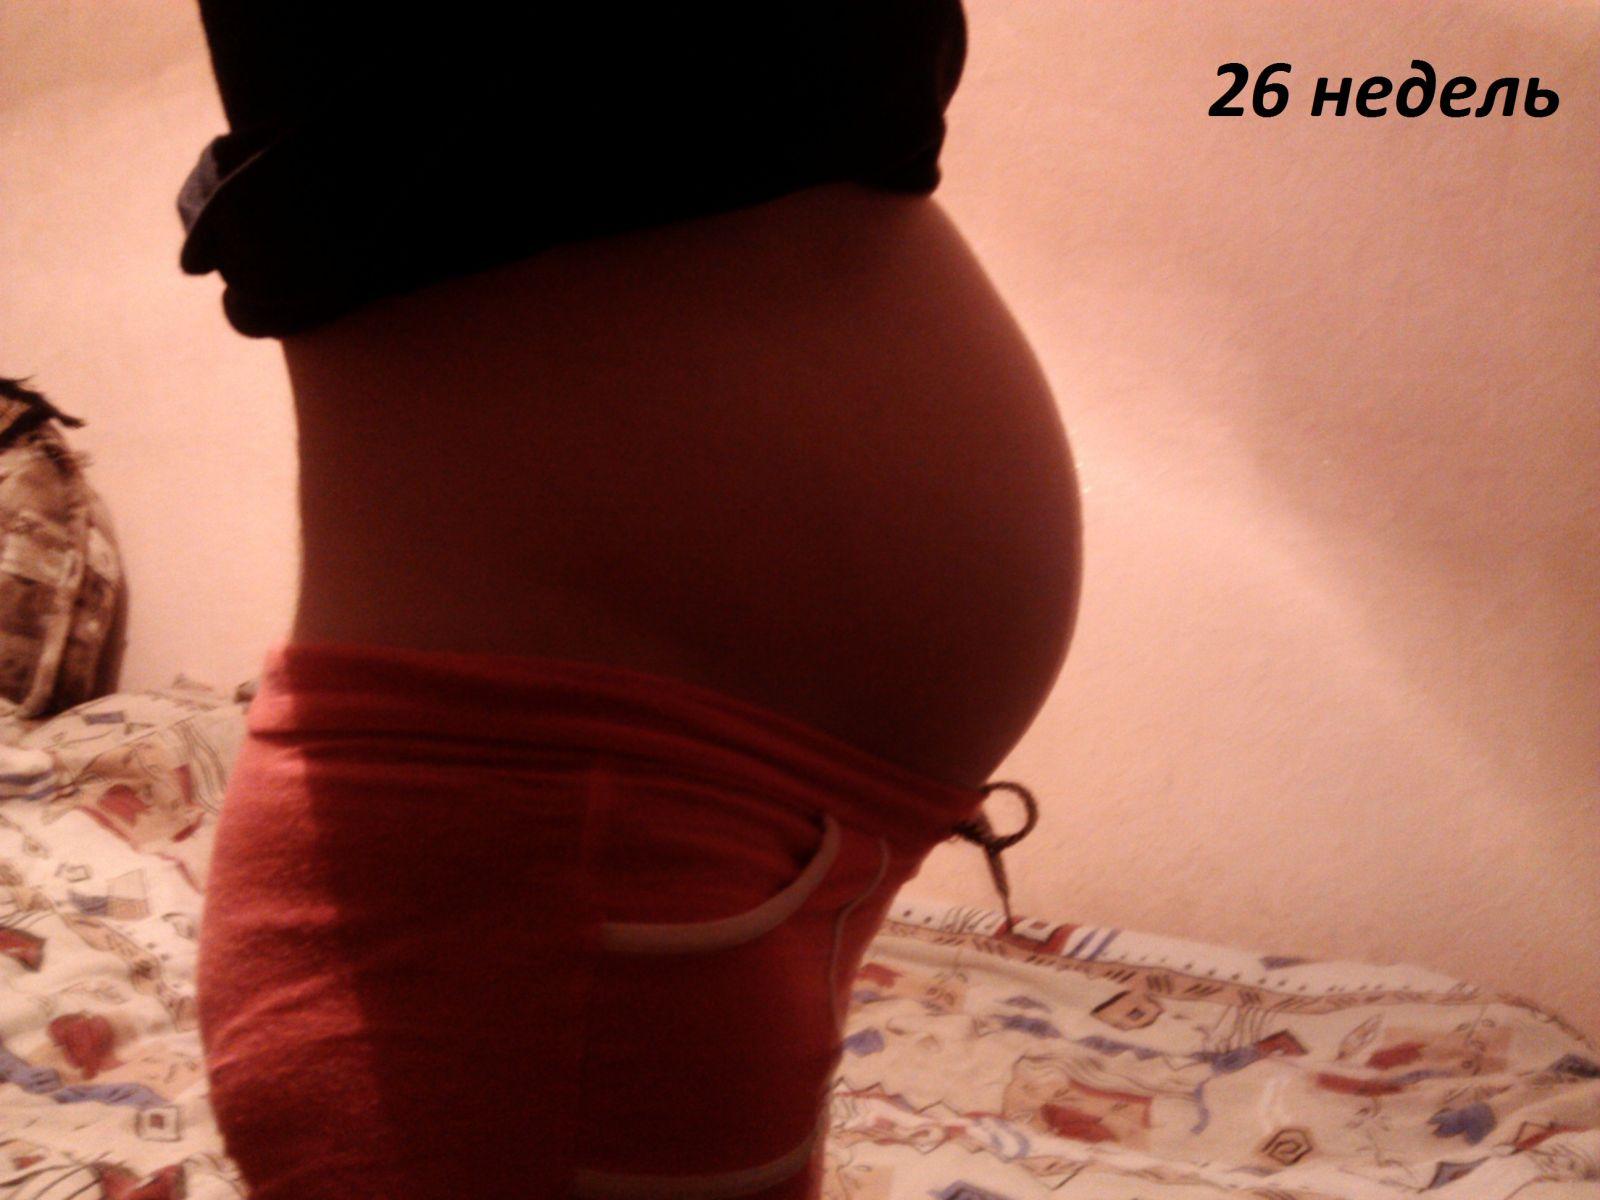 Ребенку 17 недель фото живота